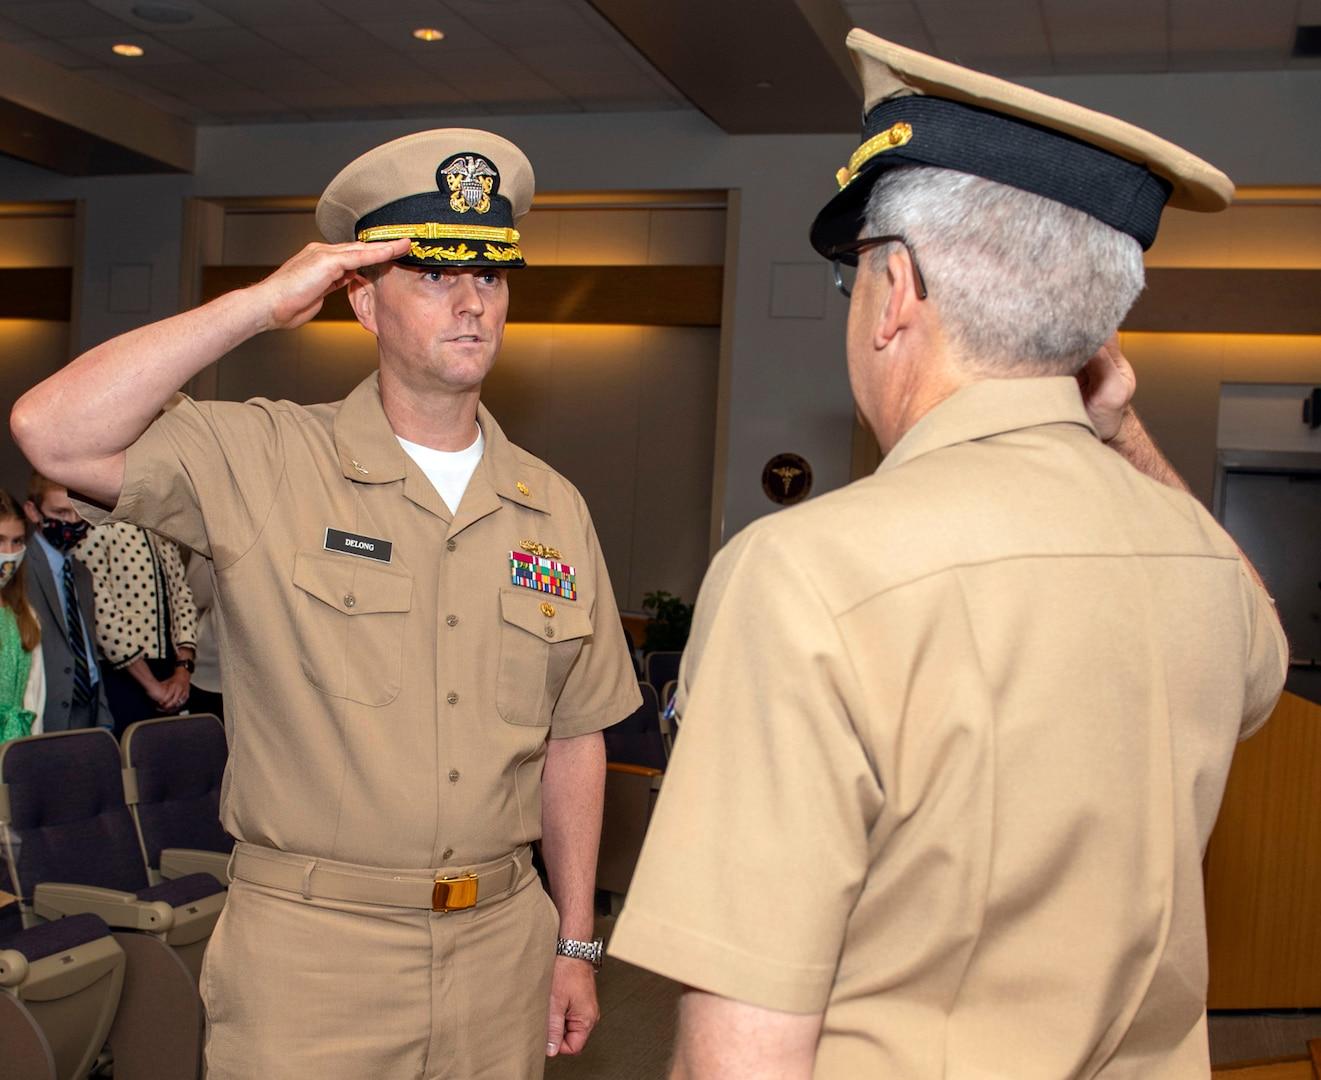 Gerald Delong salutes Capt. Adam Armstrong, as he assumes command.